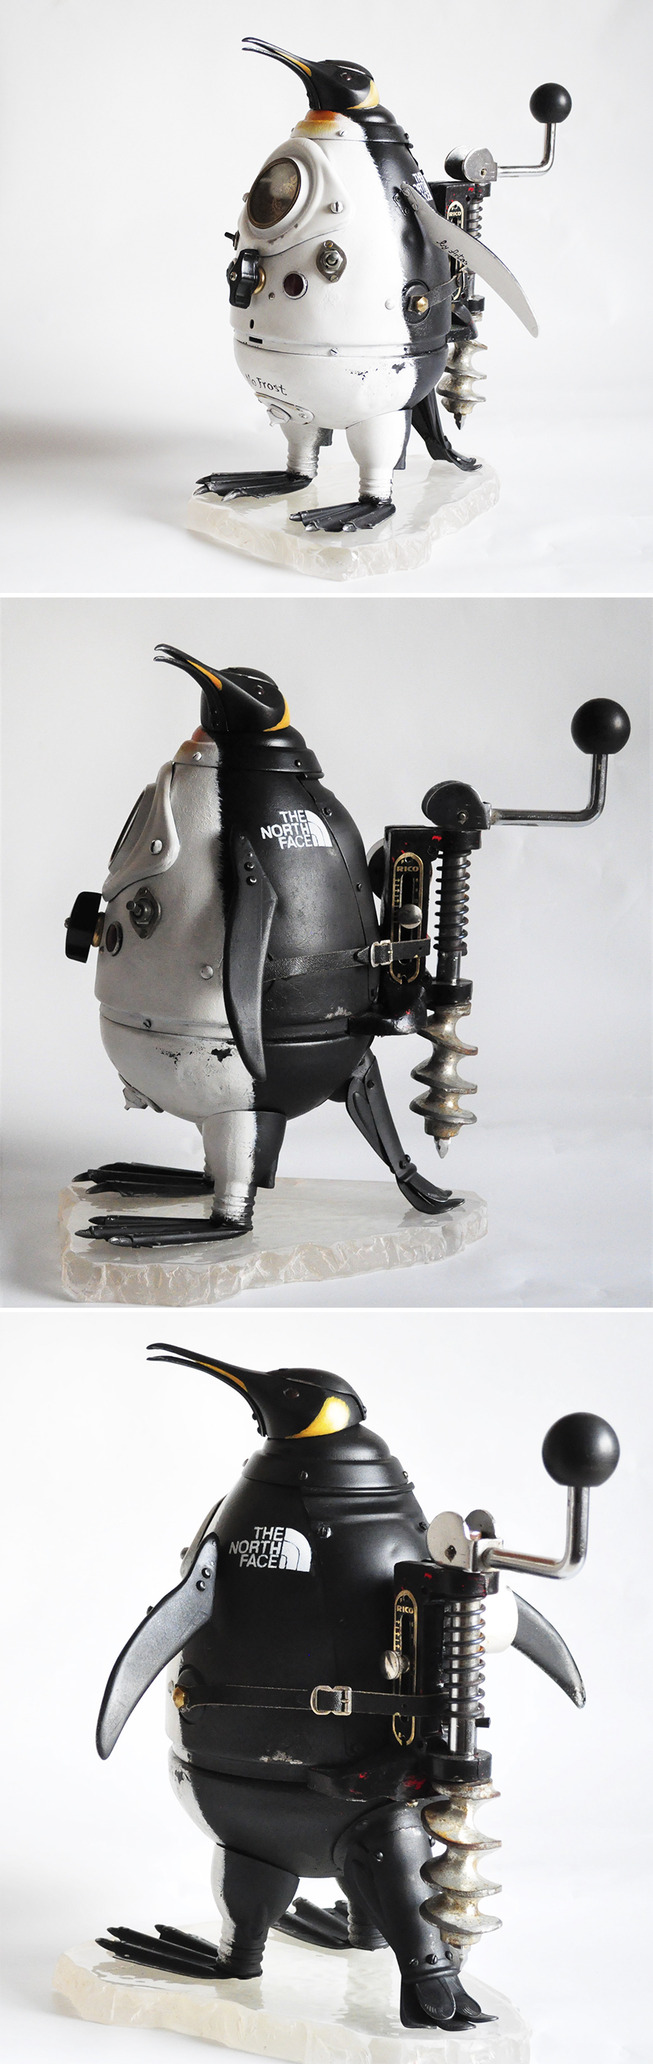 My-steampunk-sculptures-58ef39c5e5f38__880